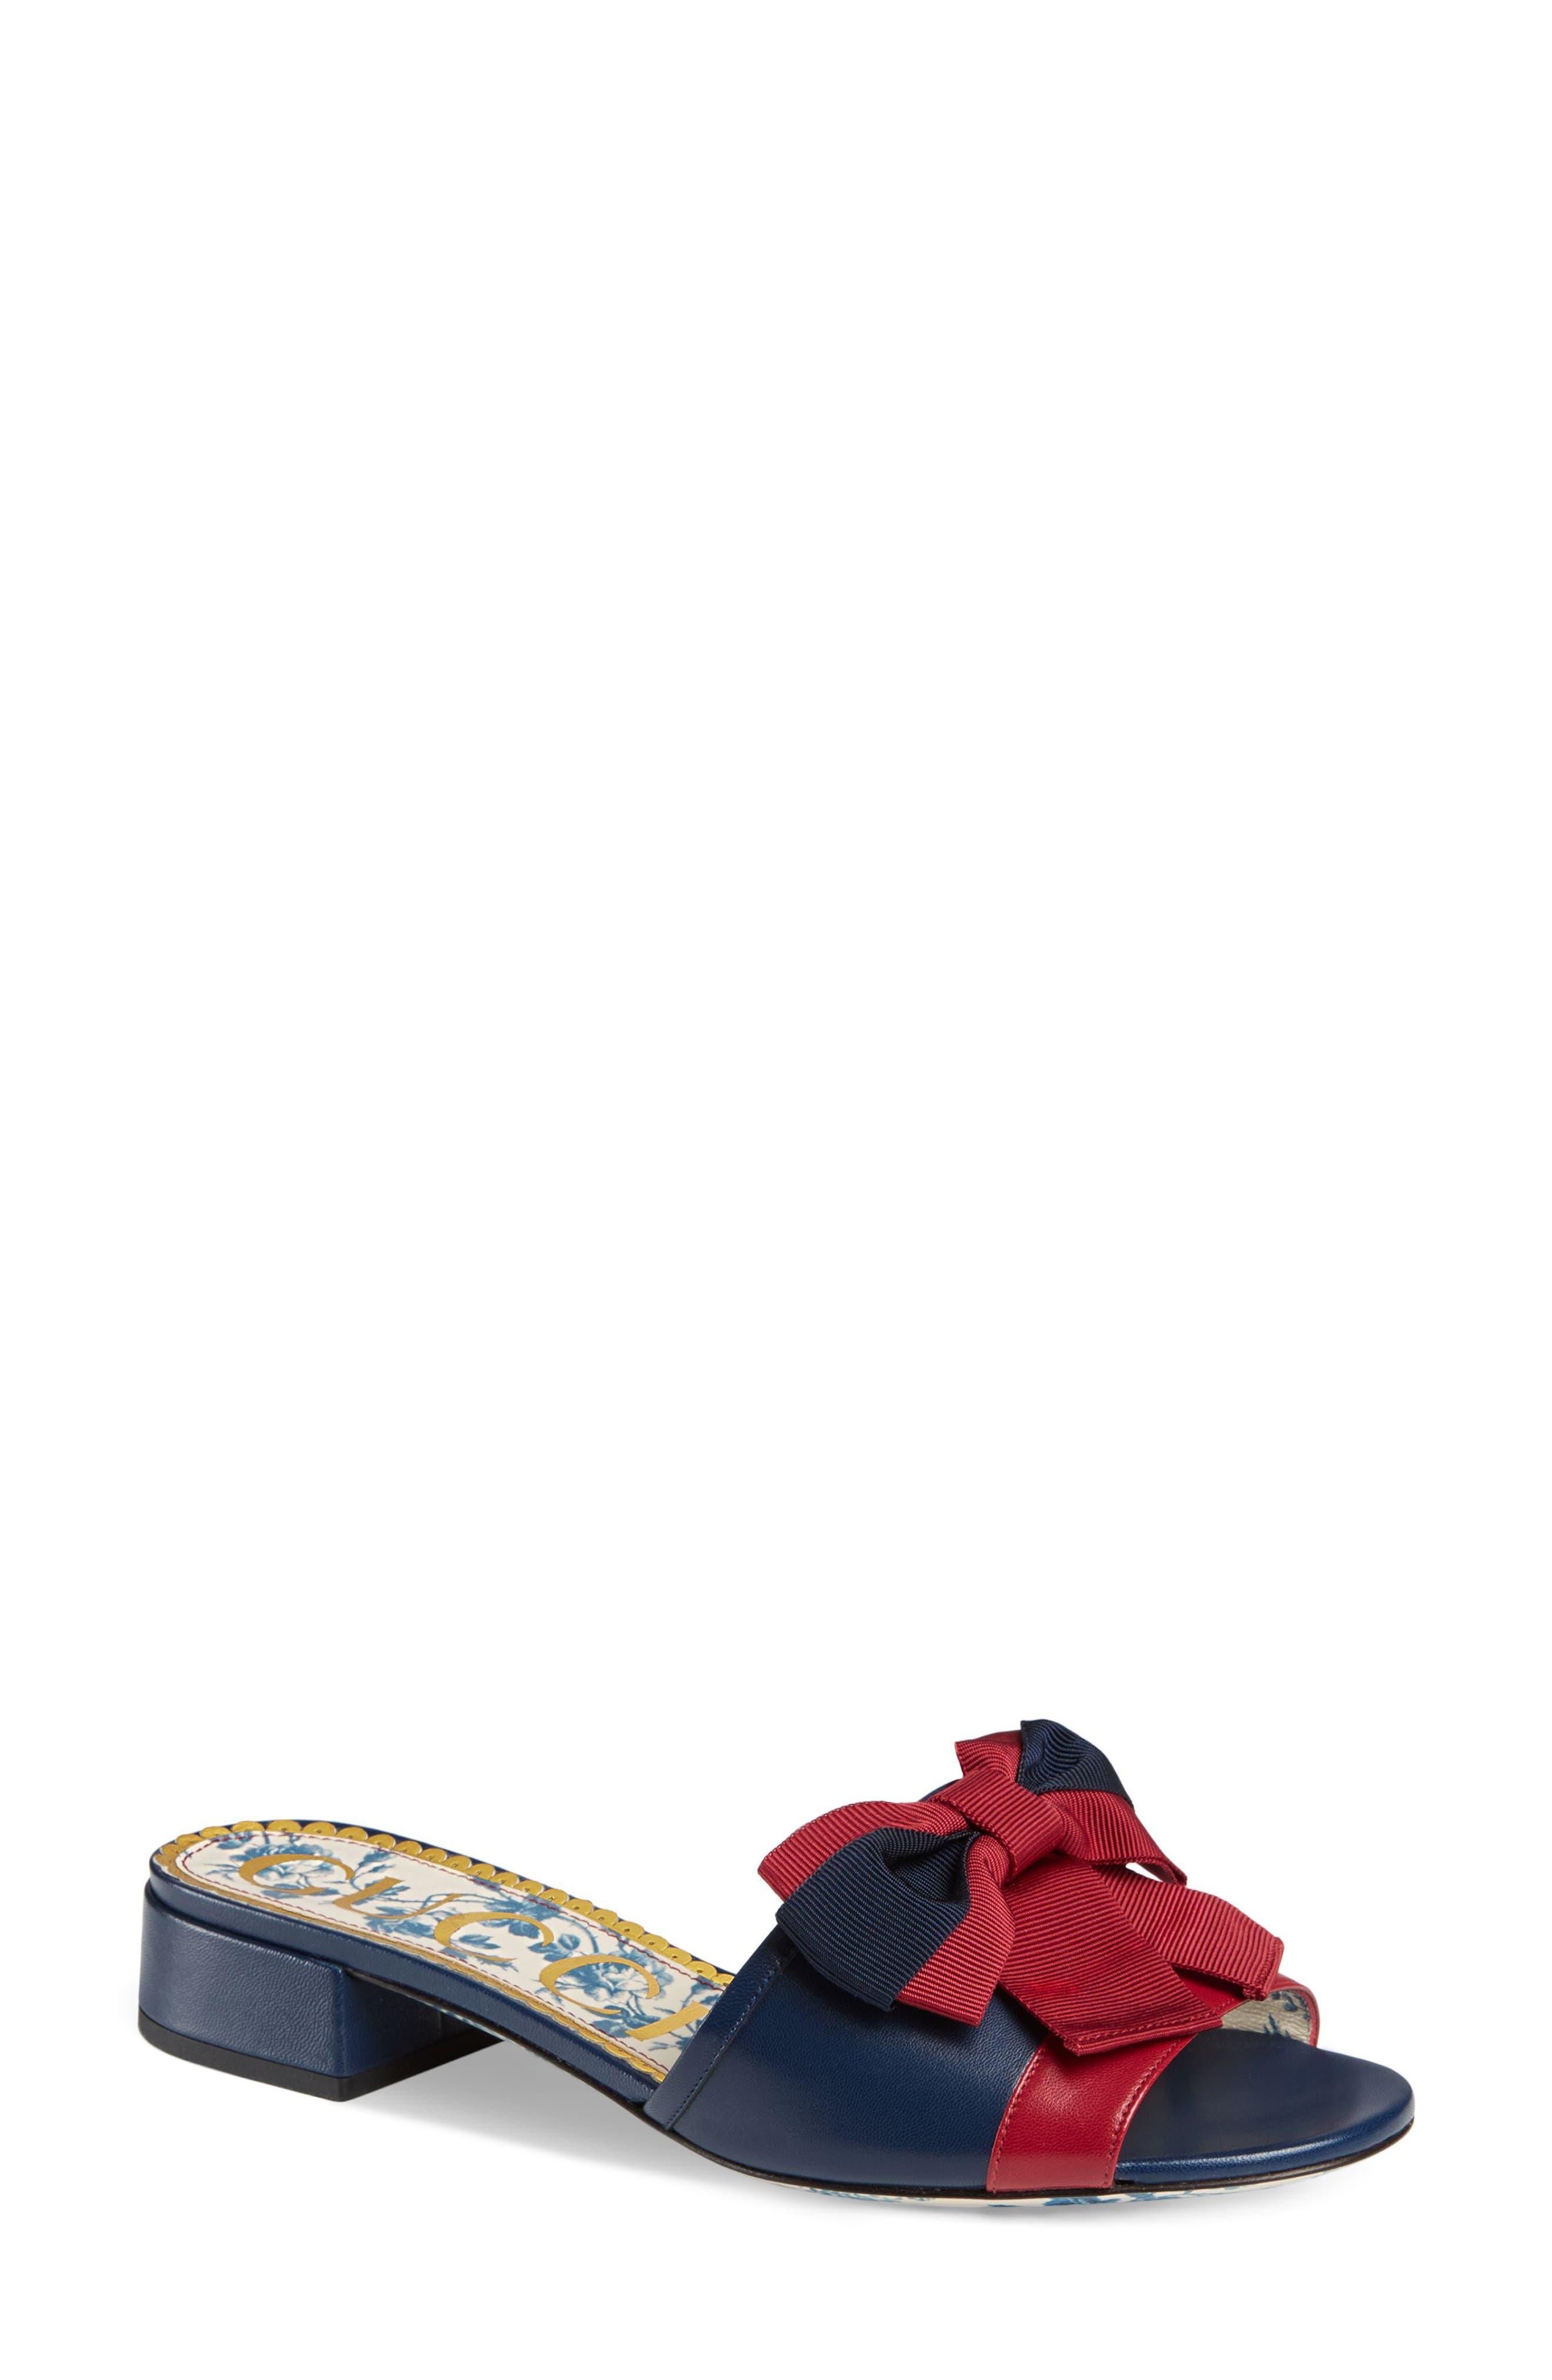 Sackville Bow Sandal,                             Main thumbnail 1, color,                             Blue/ Red